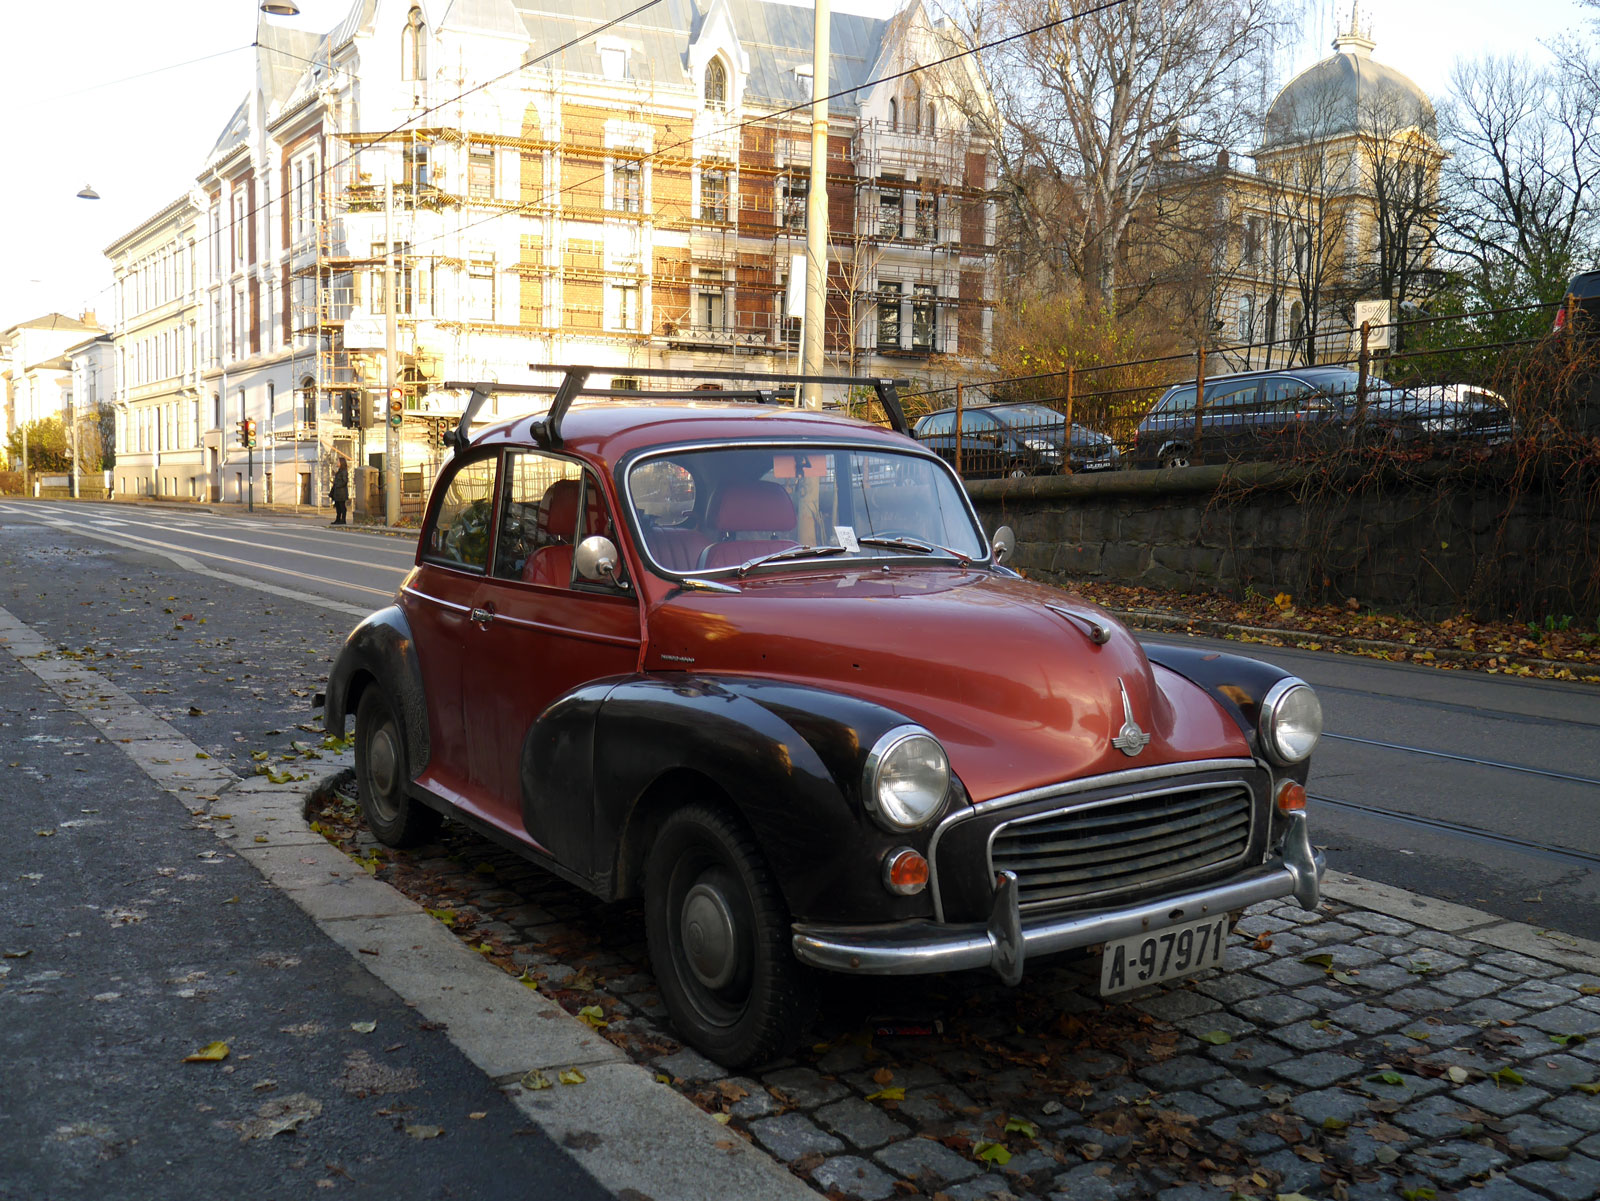 1959 Morris Minor 1000 series III